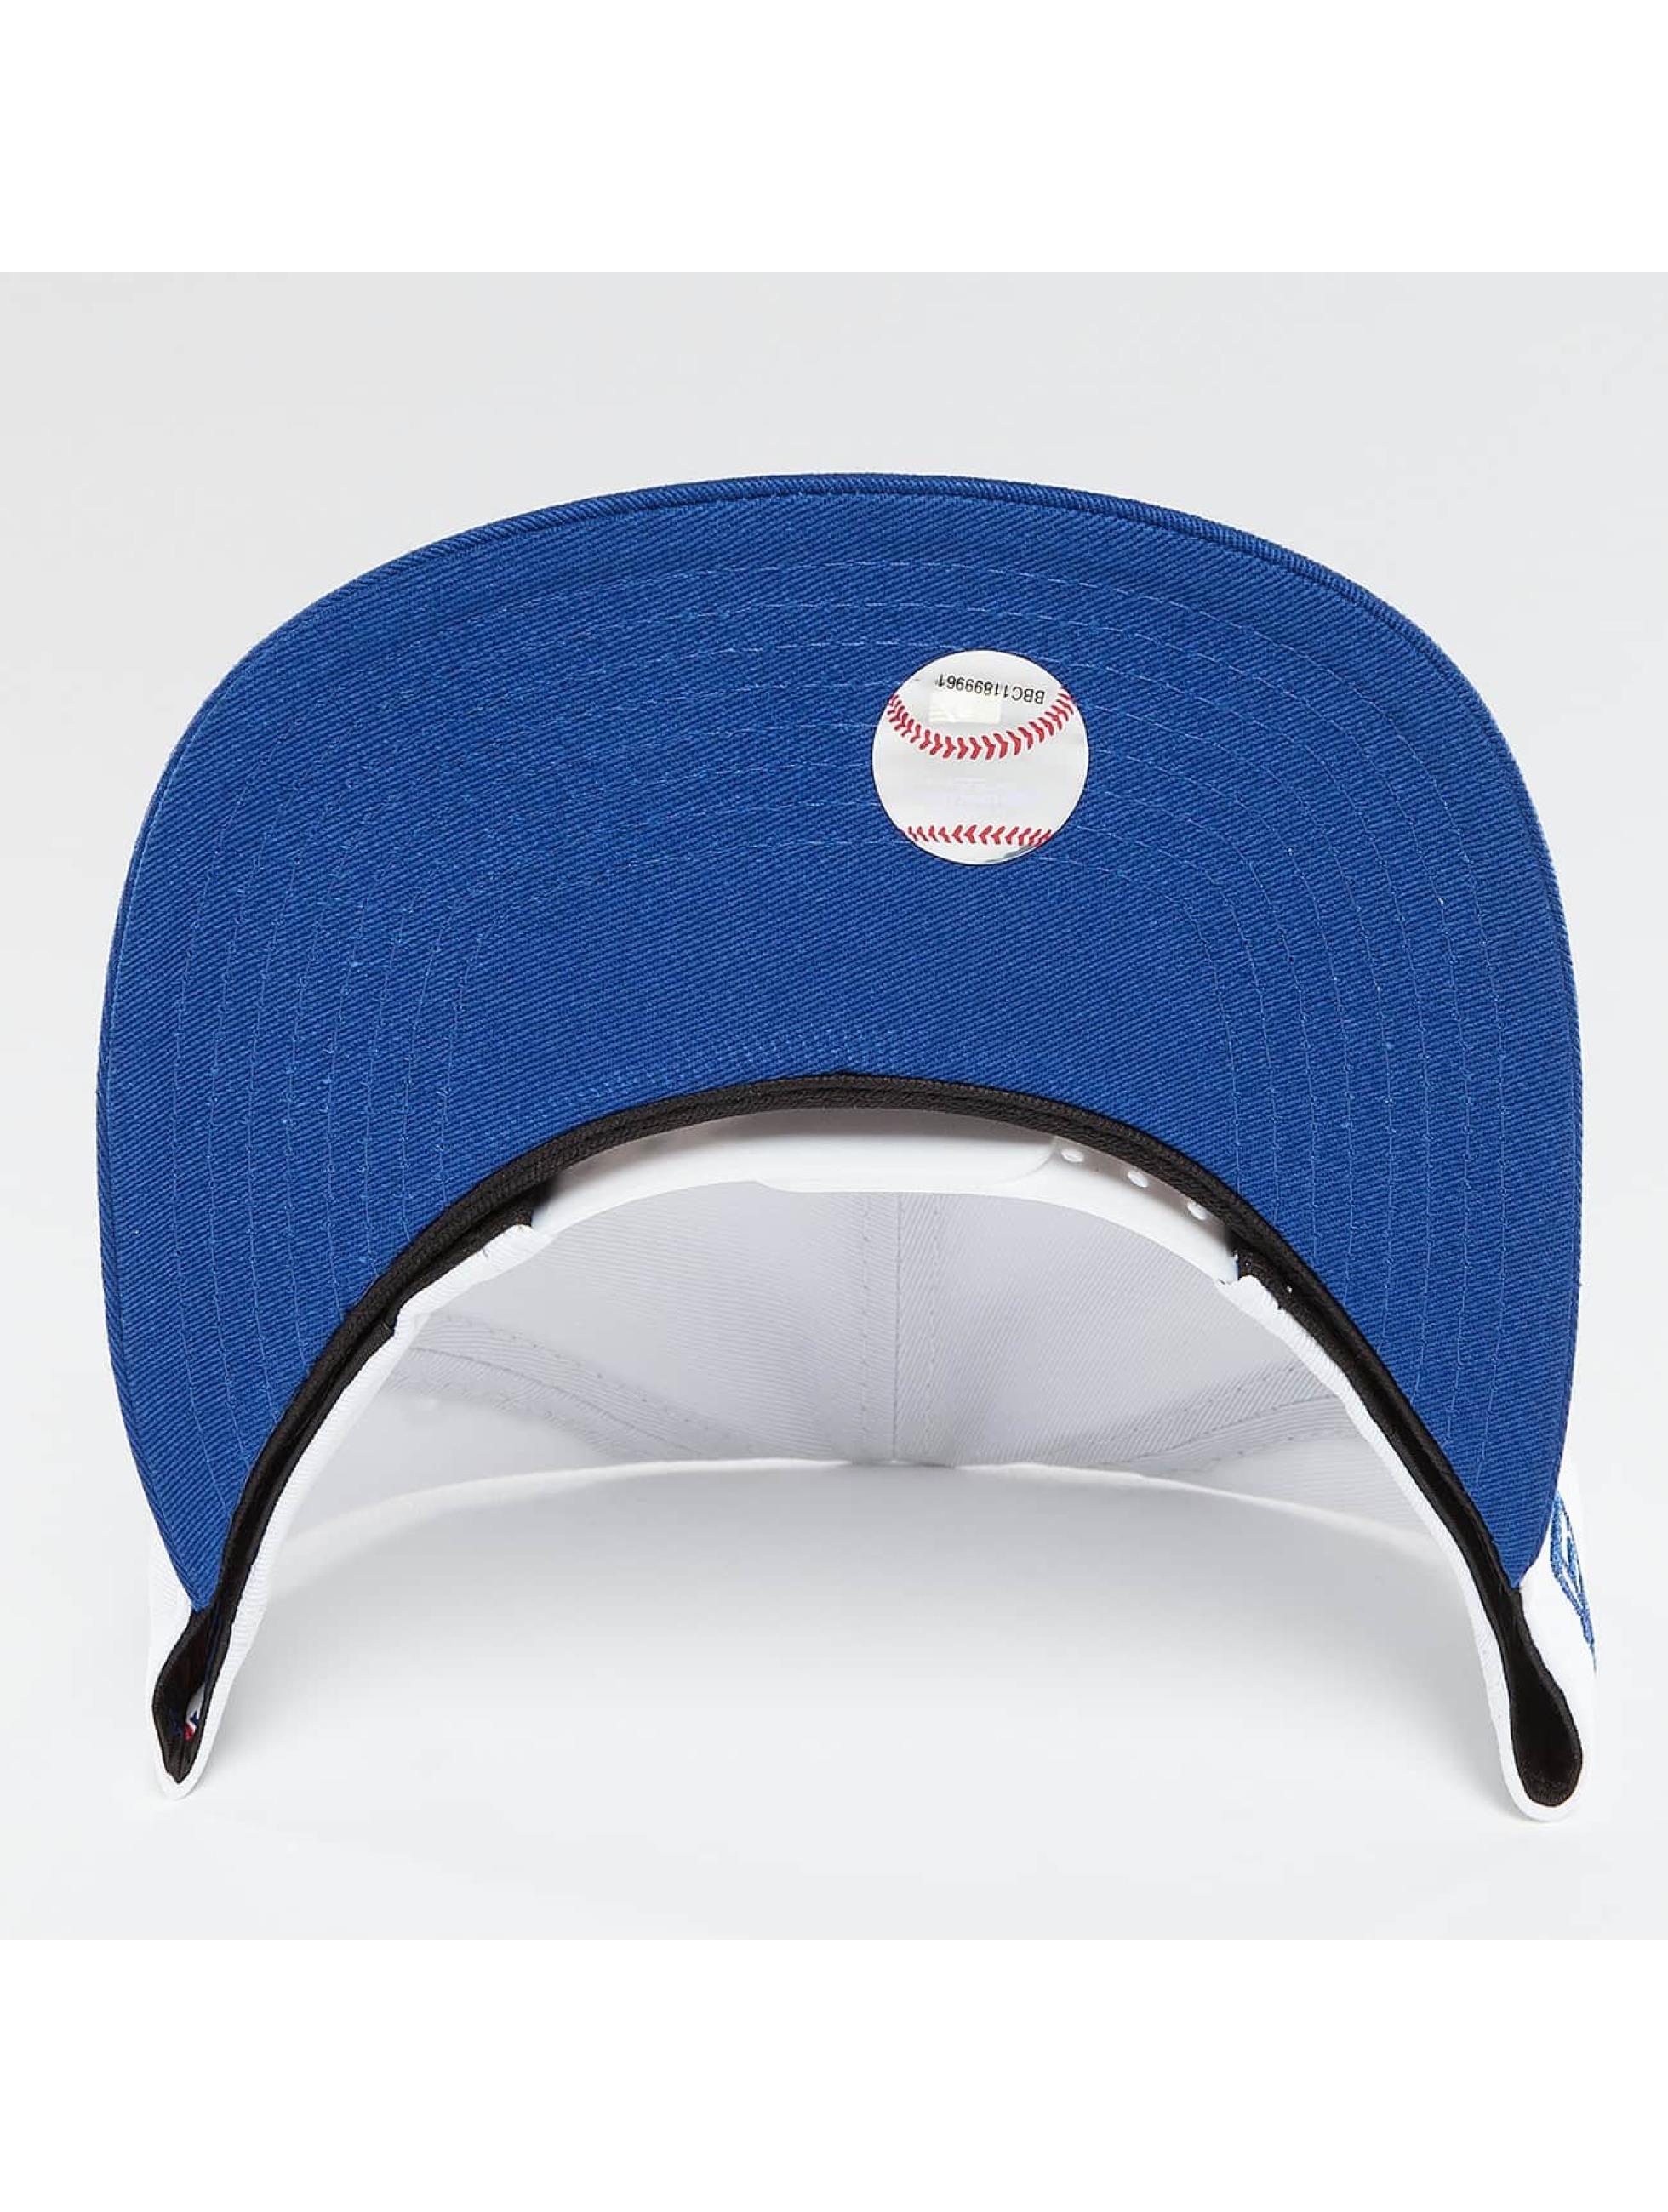 New Era Snapback Cap Contrast Crown LA Dodgers 9Fifty white